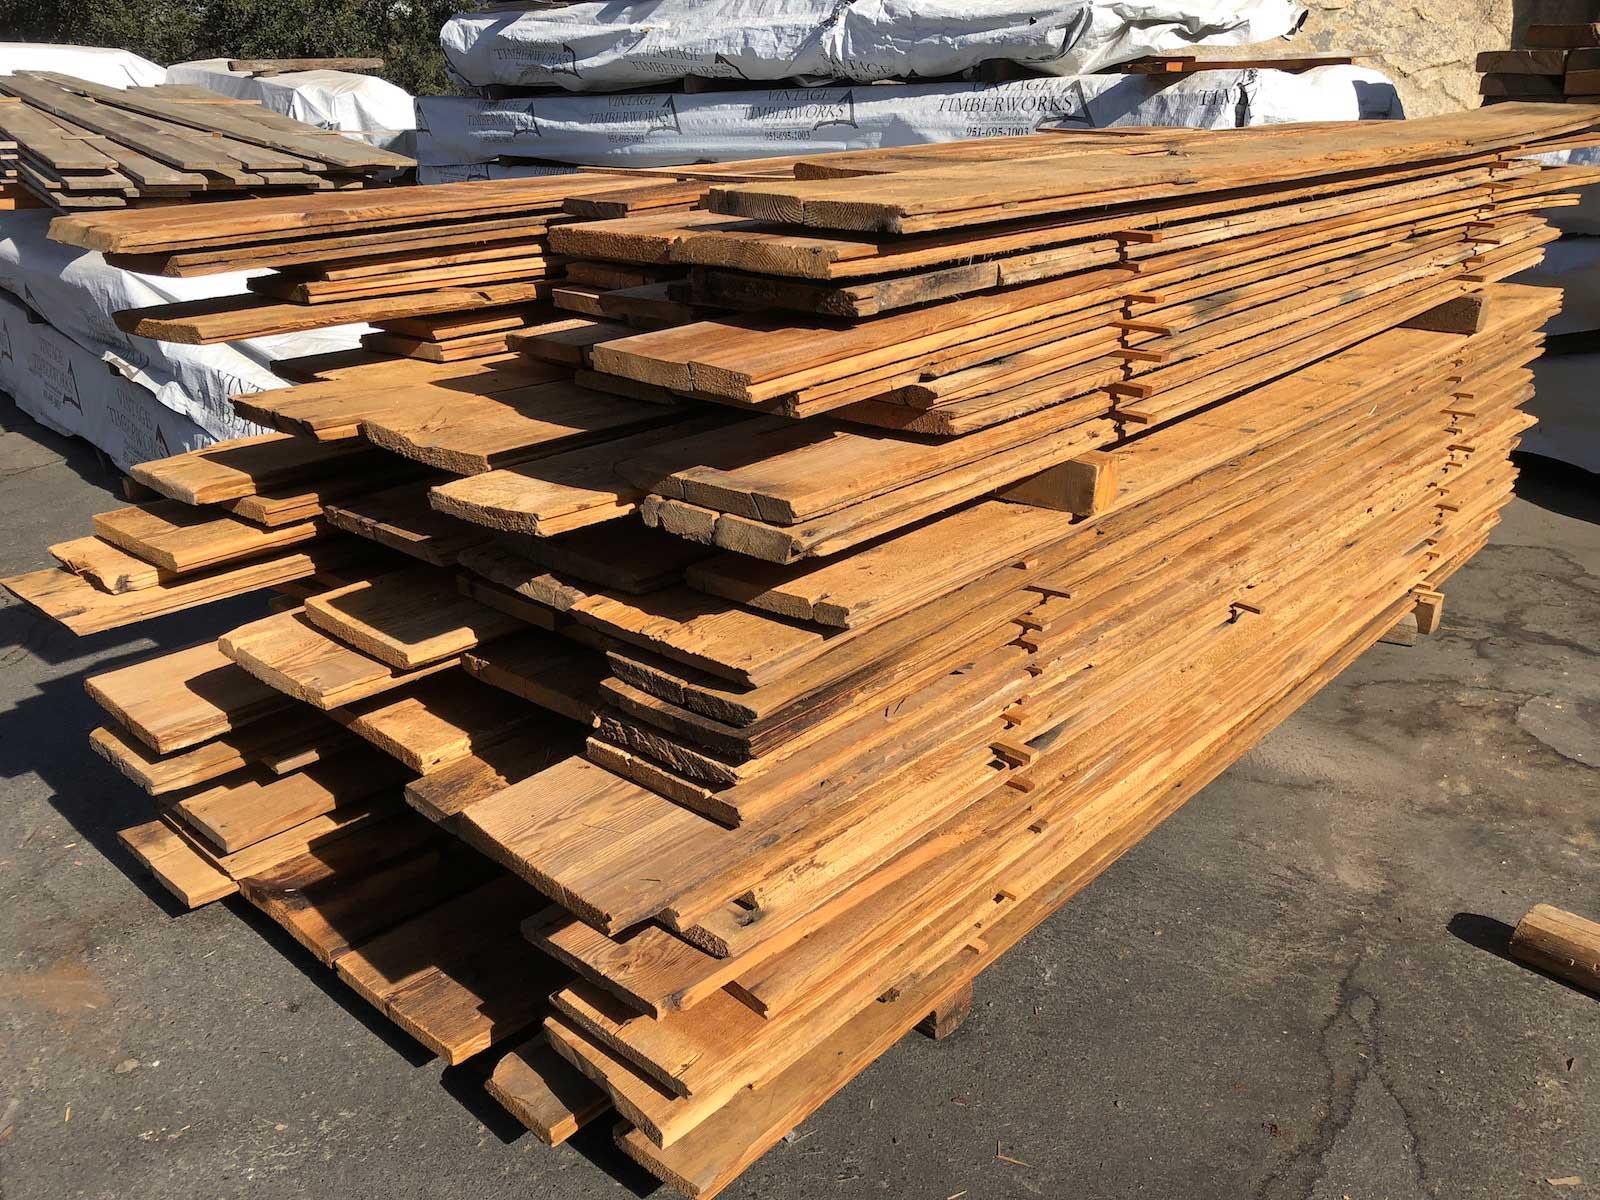 Mixed Reclaimed Wood Siding Vintage Timberworks